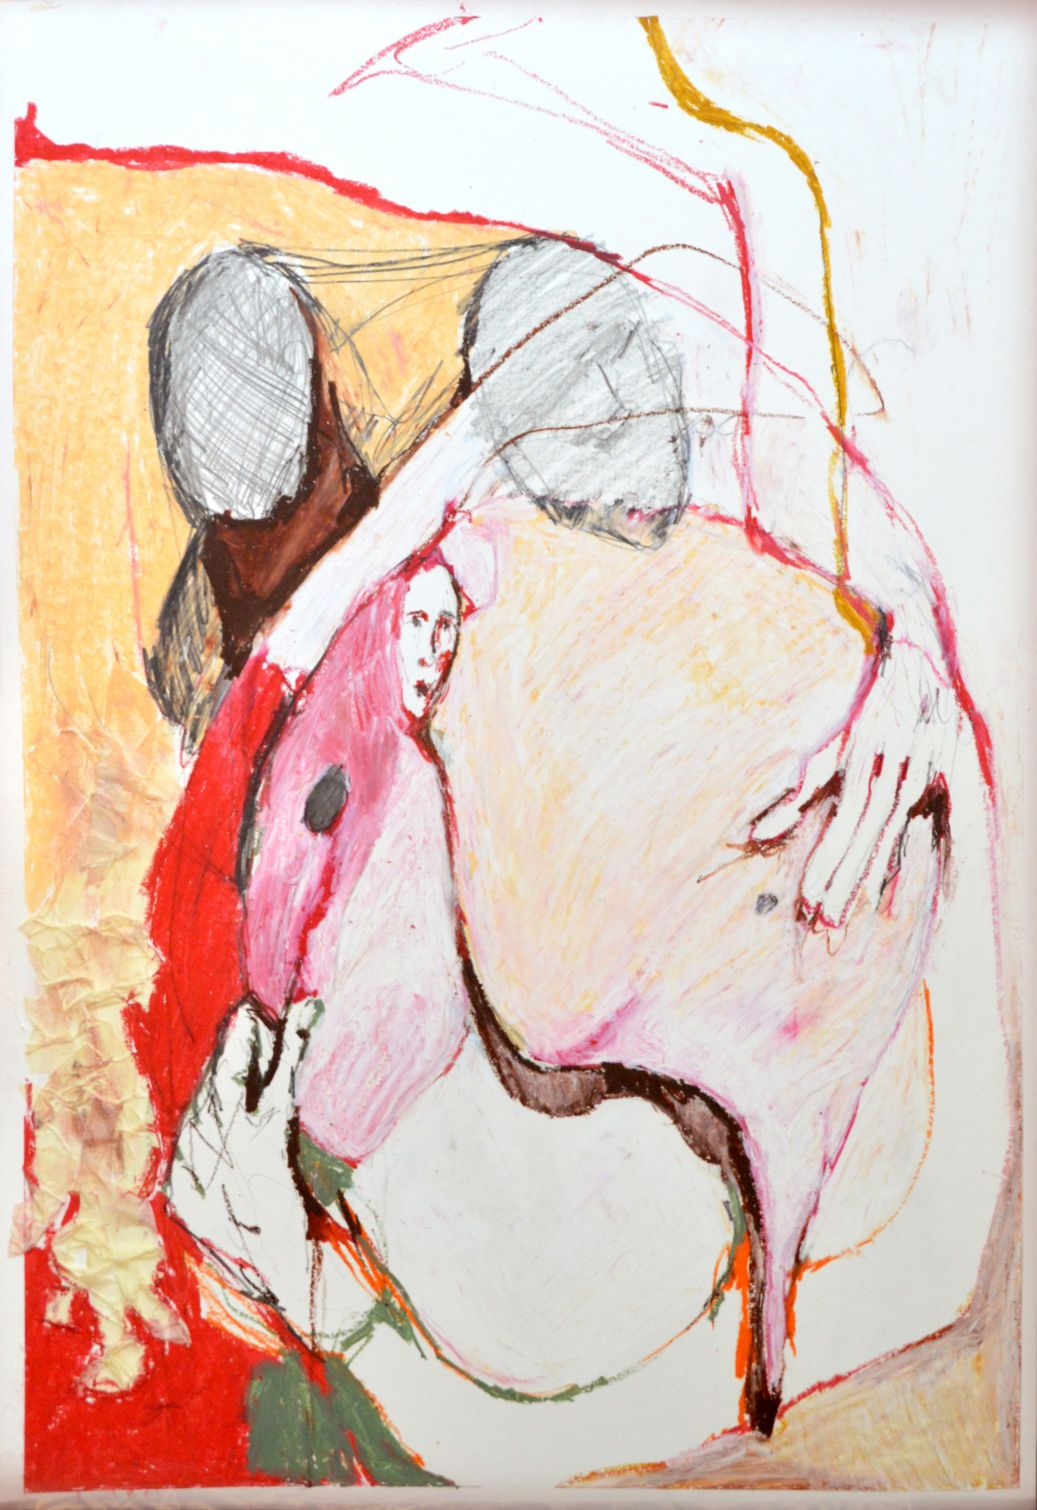 Me agarro la barriga (2019) - Elisa Pinto